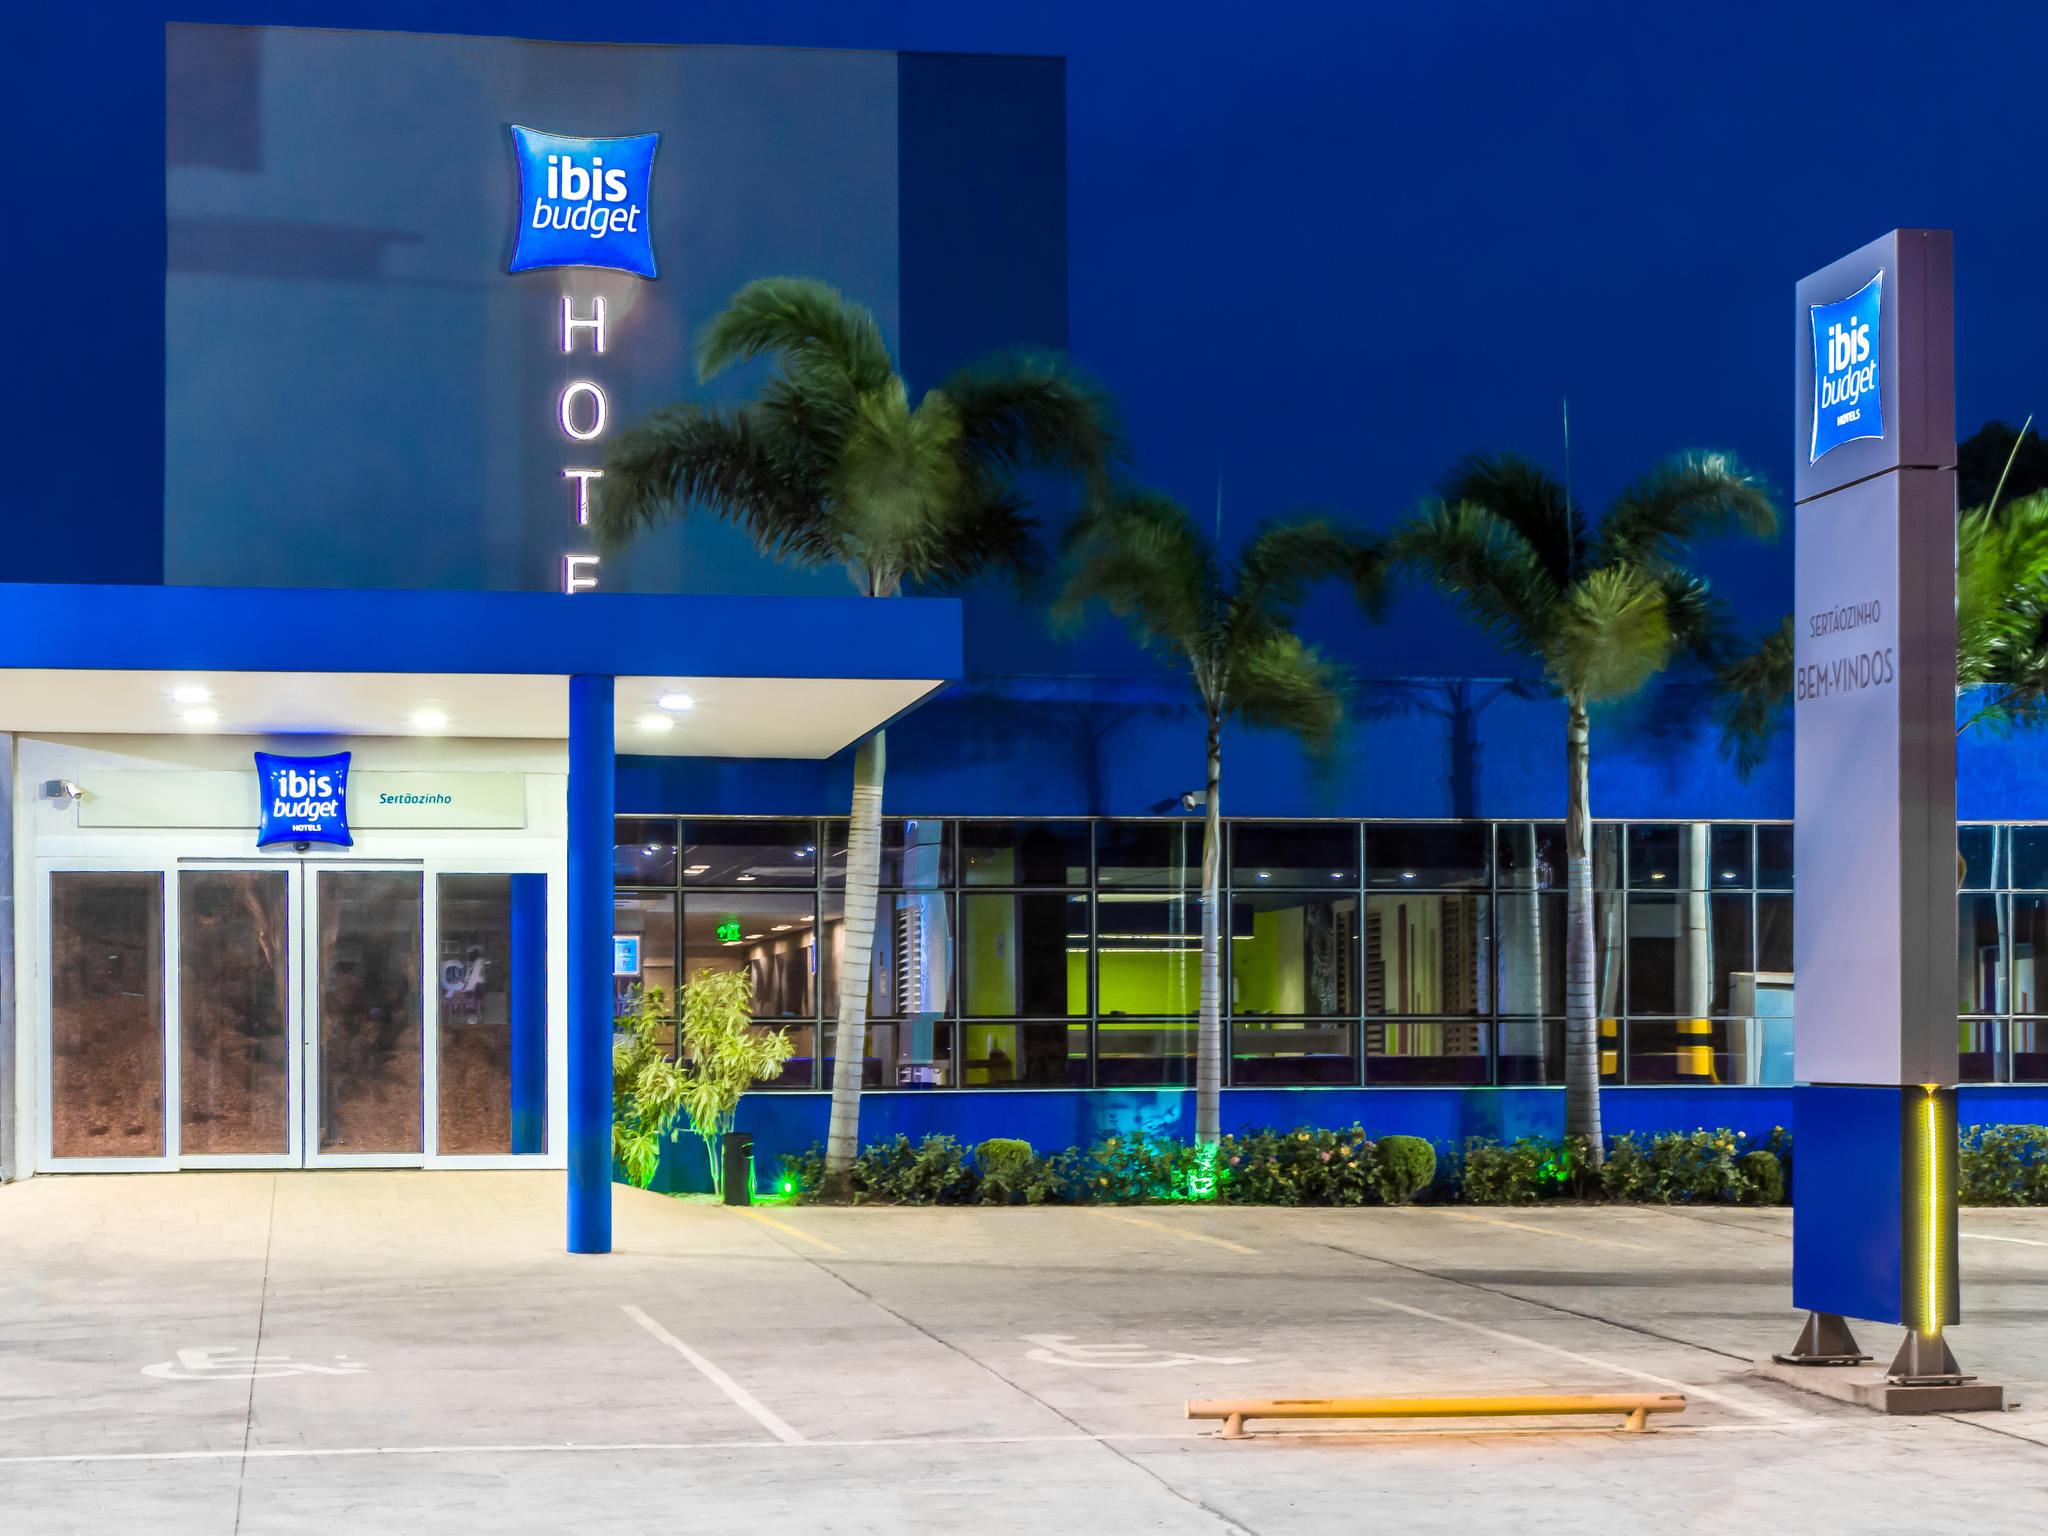 Hotel – ibis budget Sertaozinho